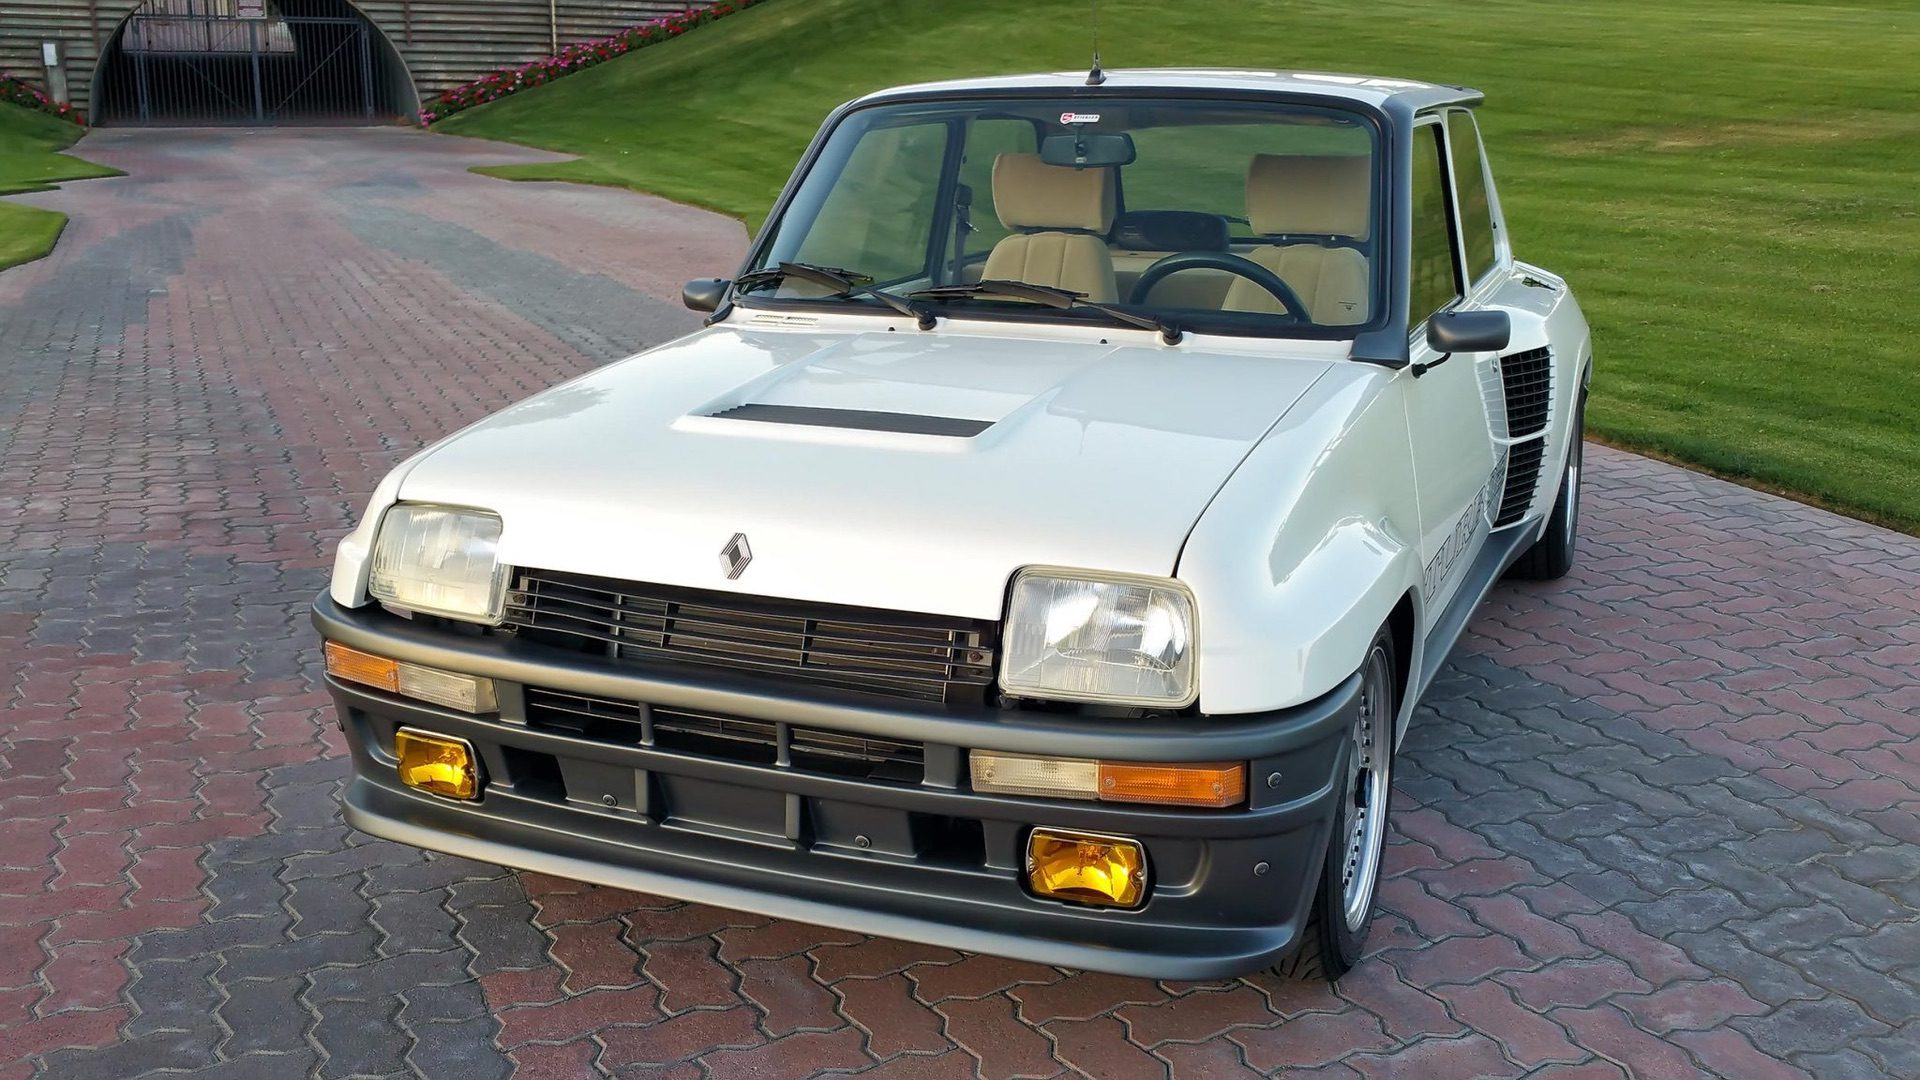 1985_Renault_R5_Turbo_2_rotary-0059